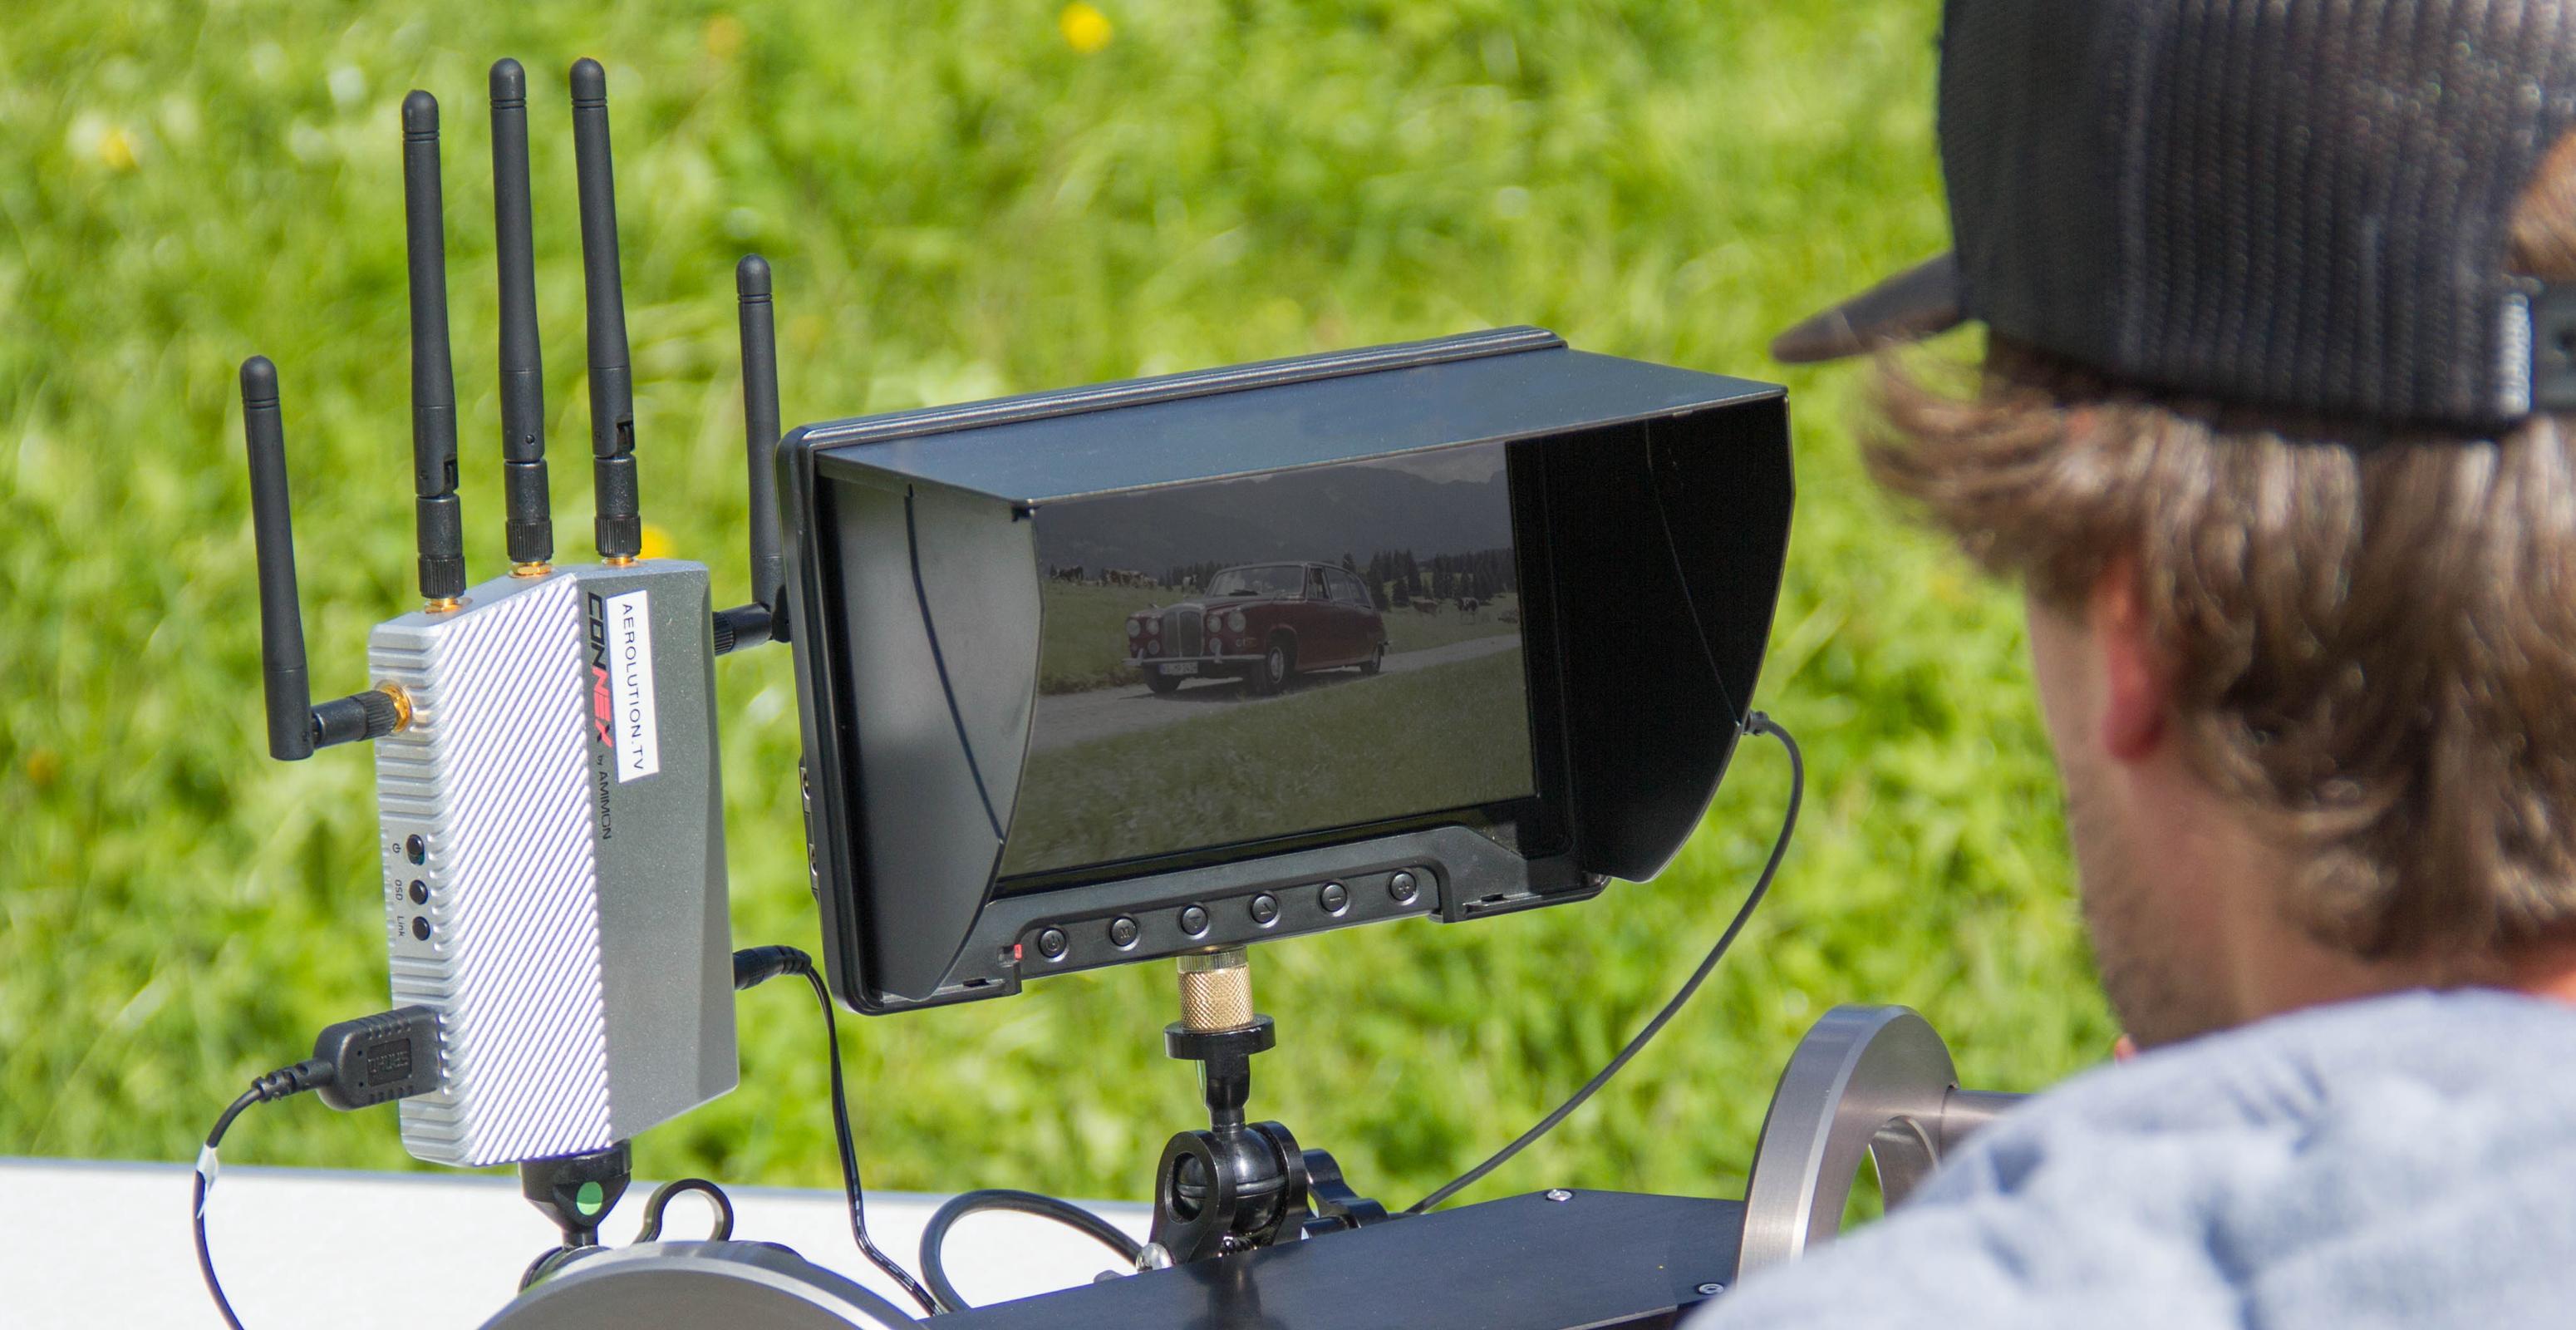 Amimon connex HD aerial munich aerolution.tv drone team